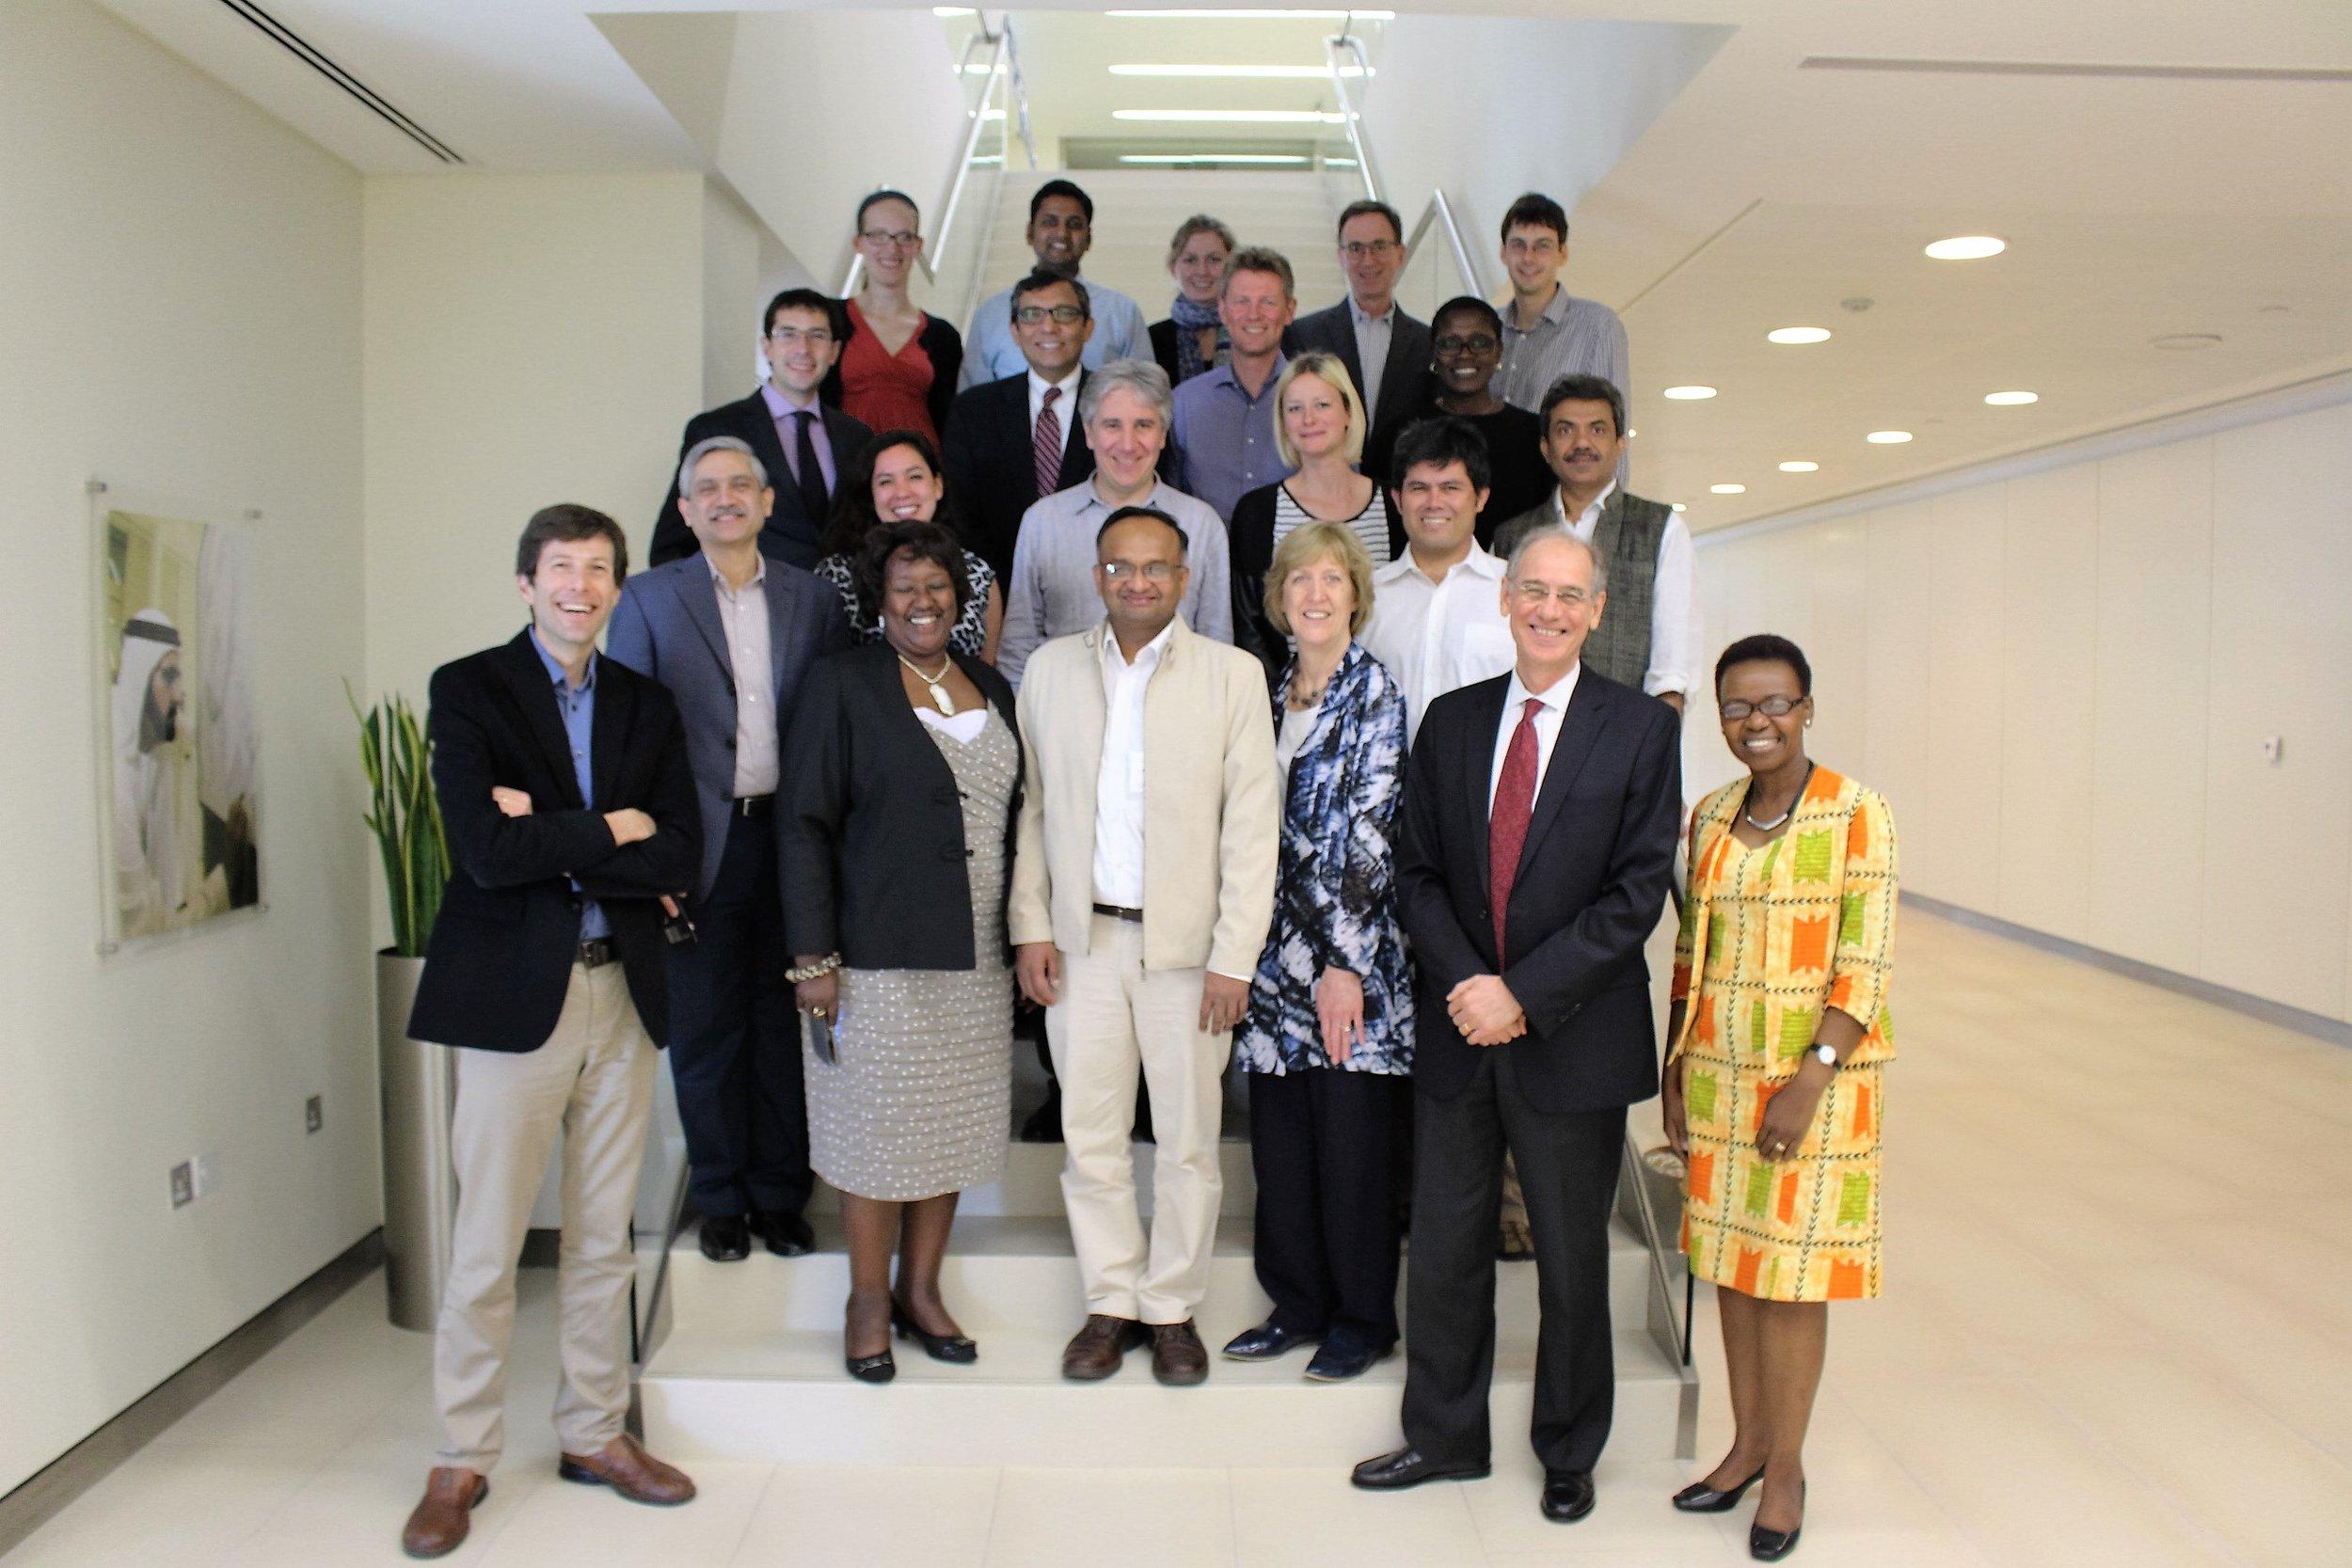 NCDI Poverty Dubai group photo.JPG